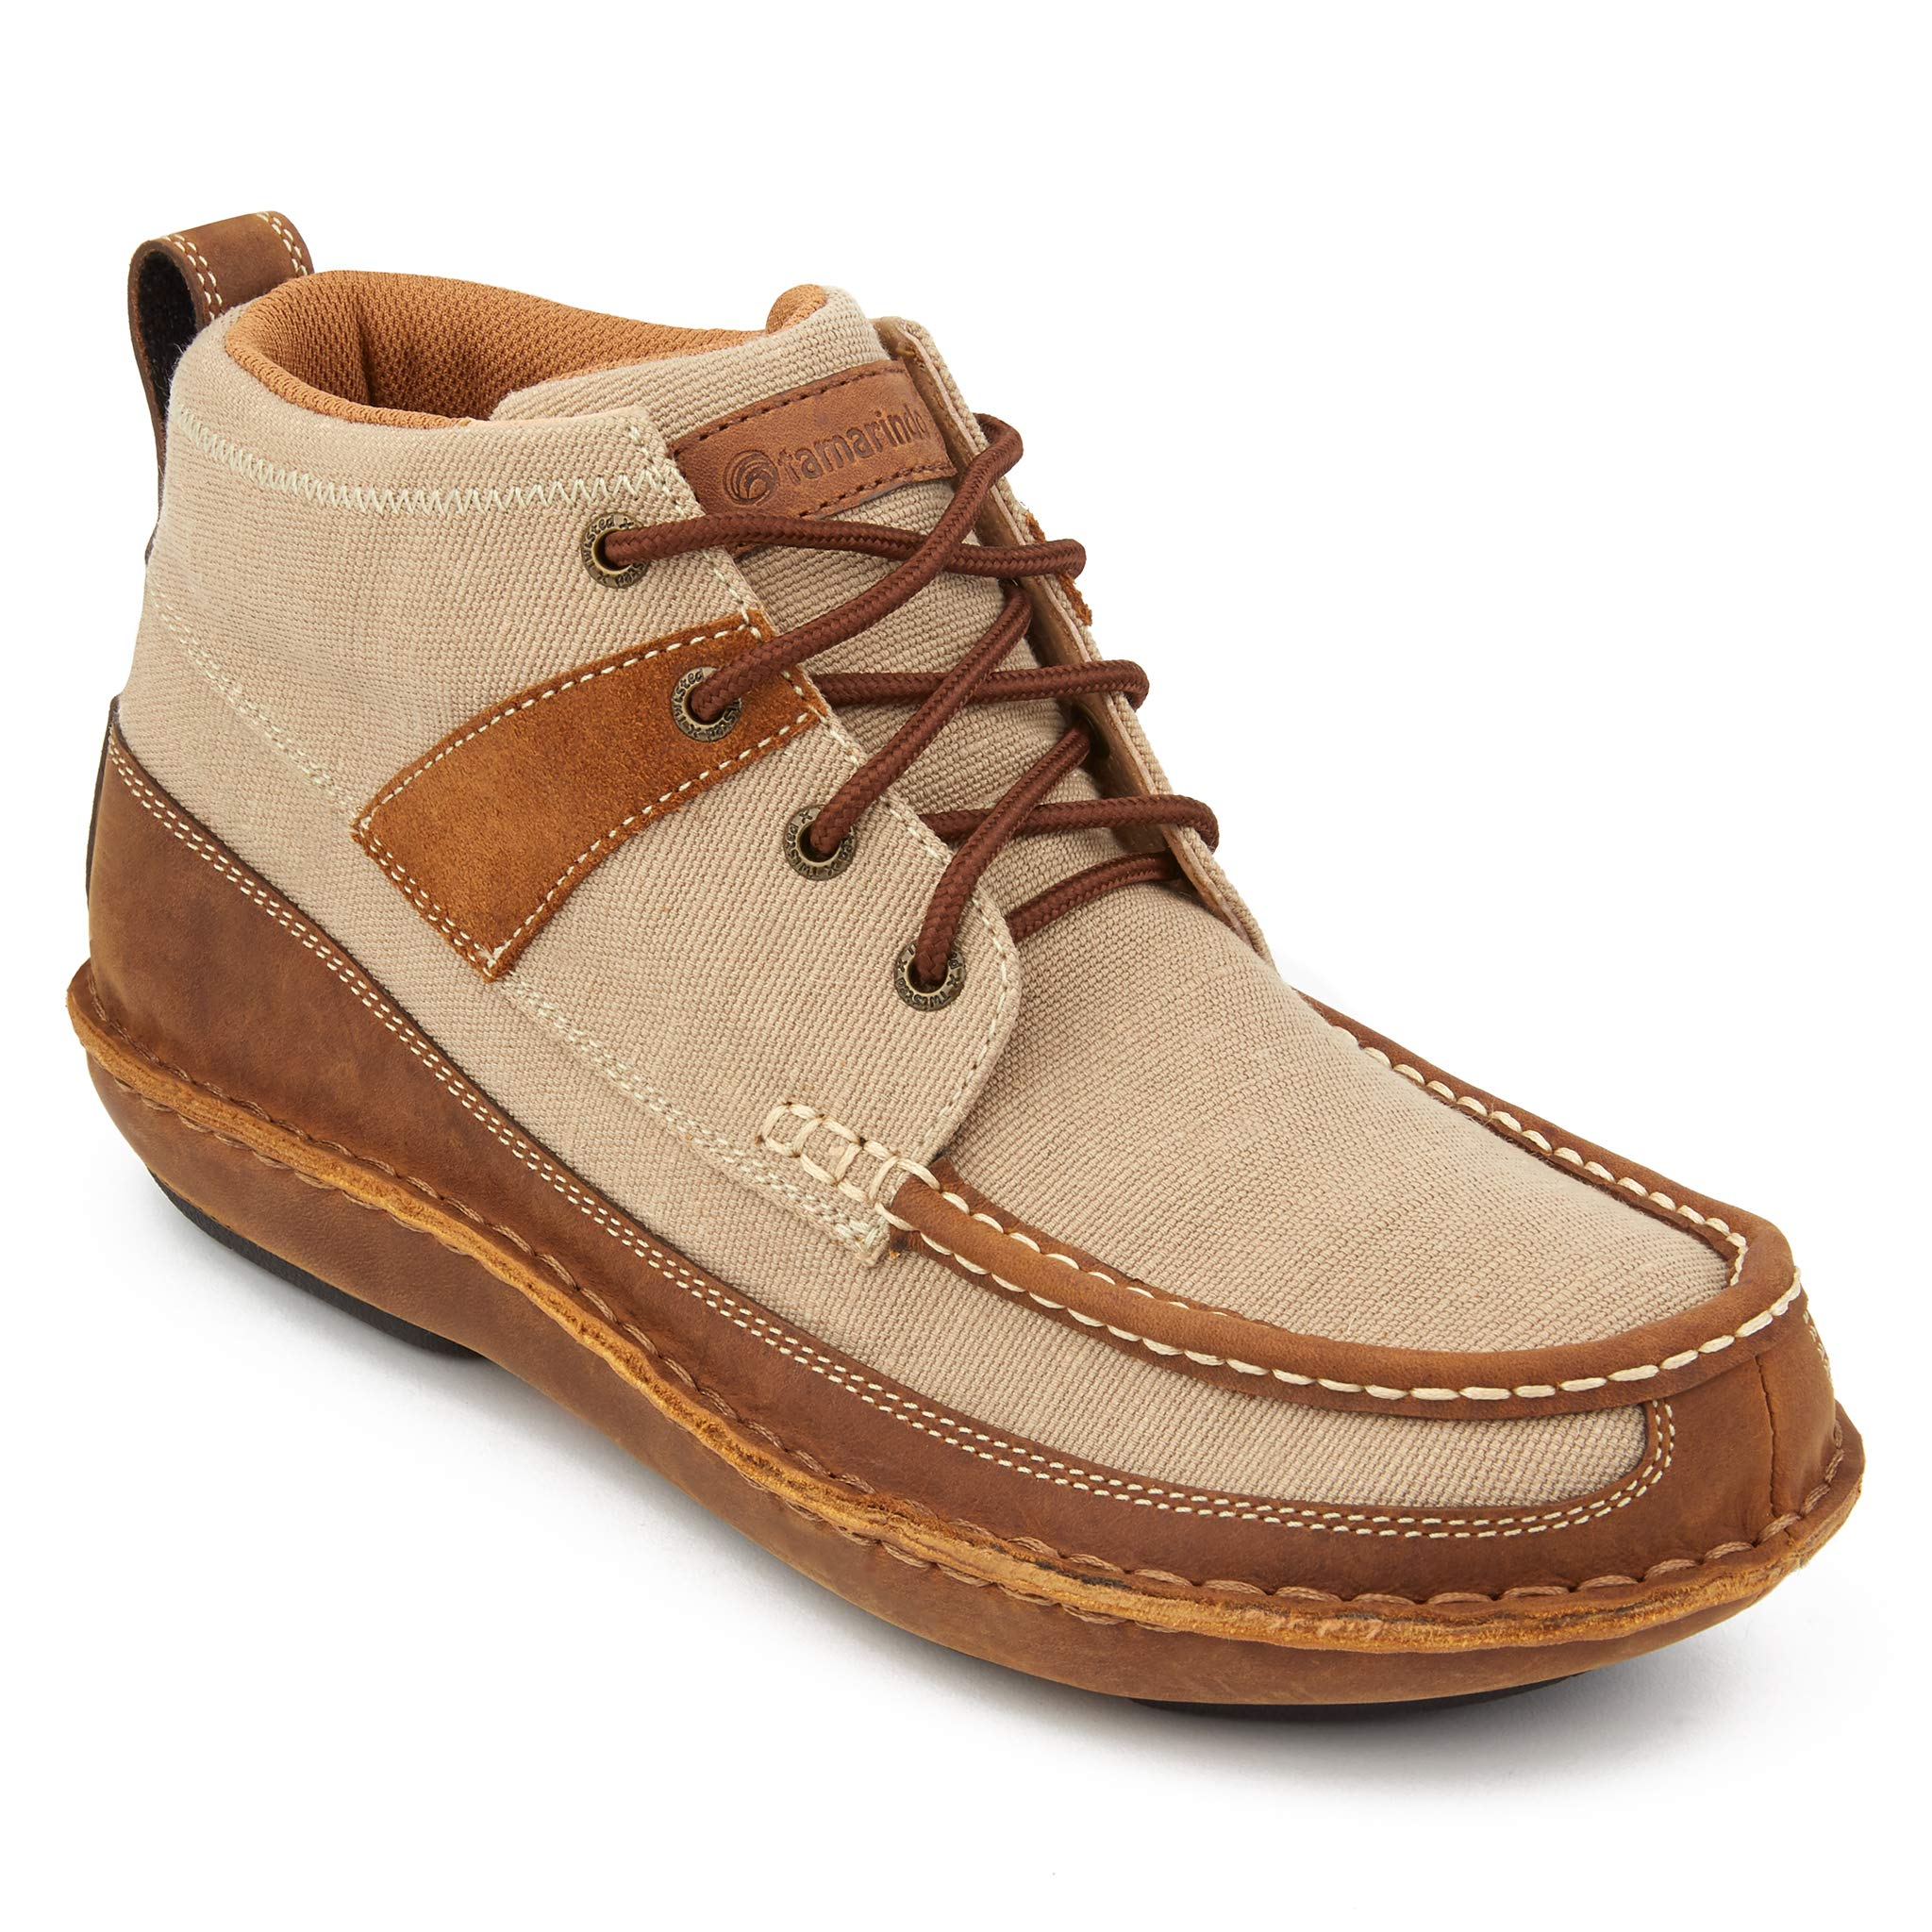 Tamarindo Canopy Boot Men's Lightweight Outdoor Hiking Shoes